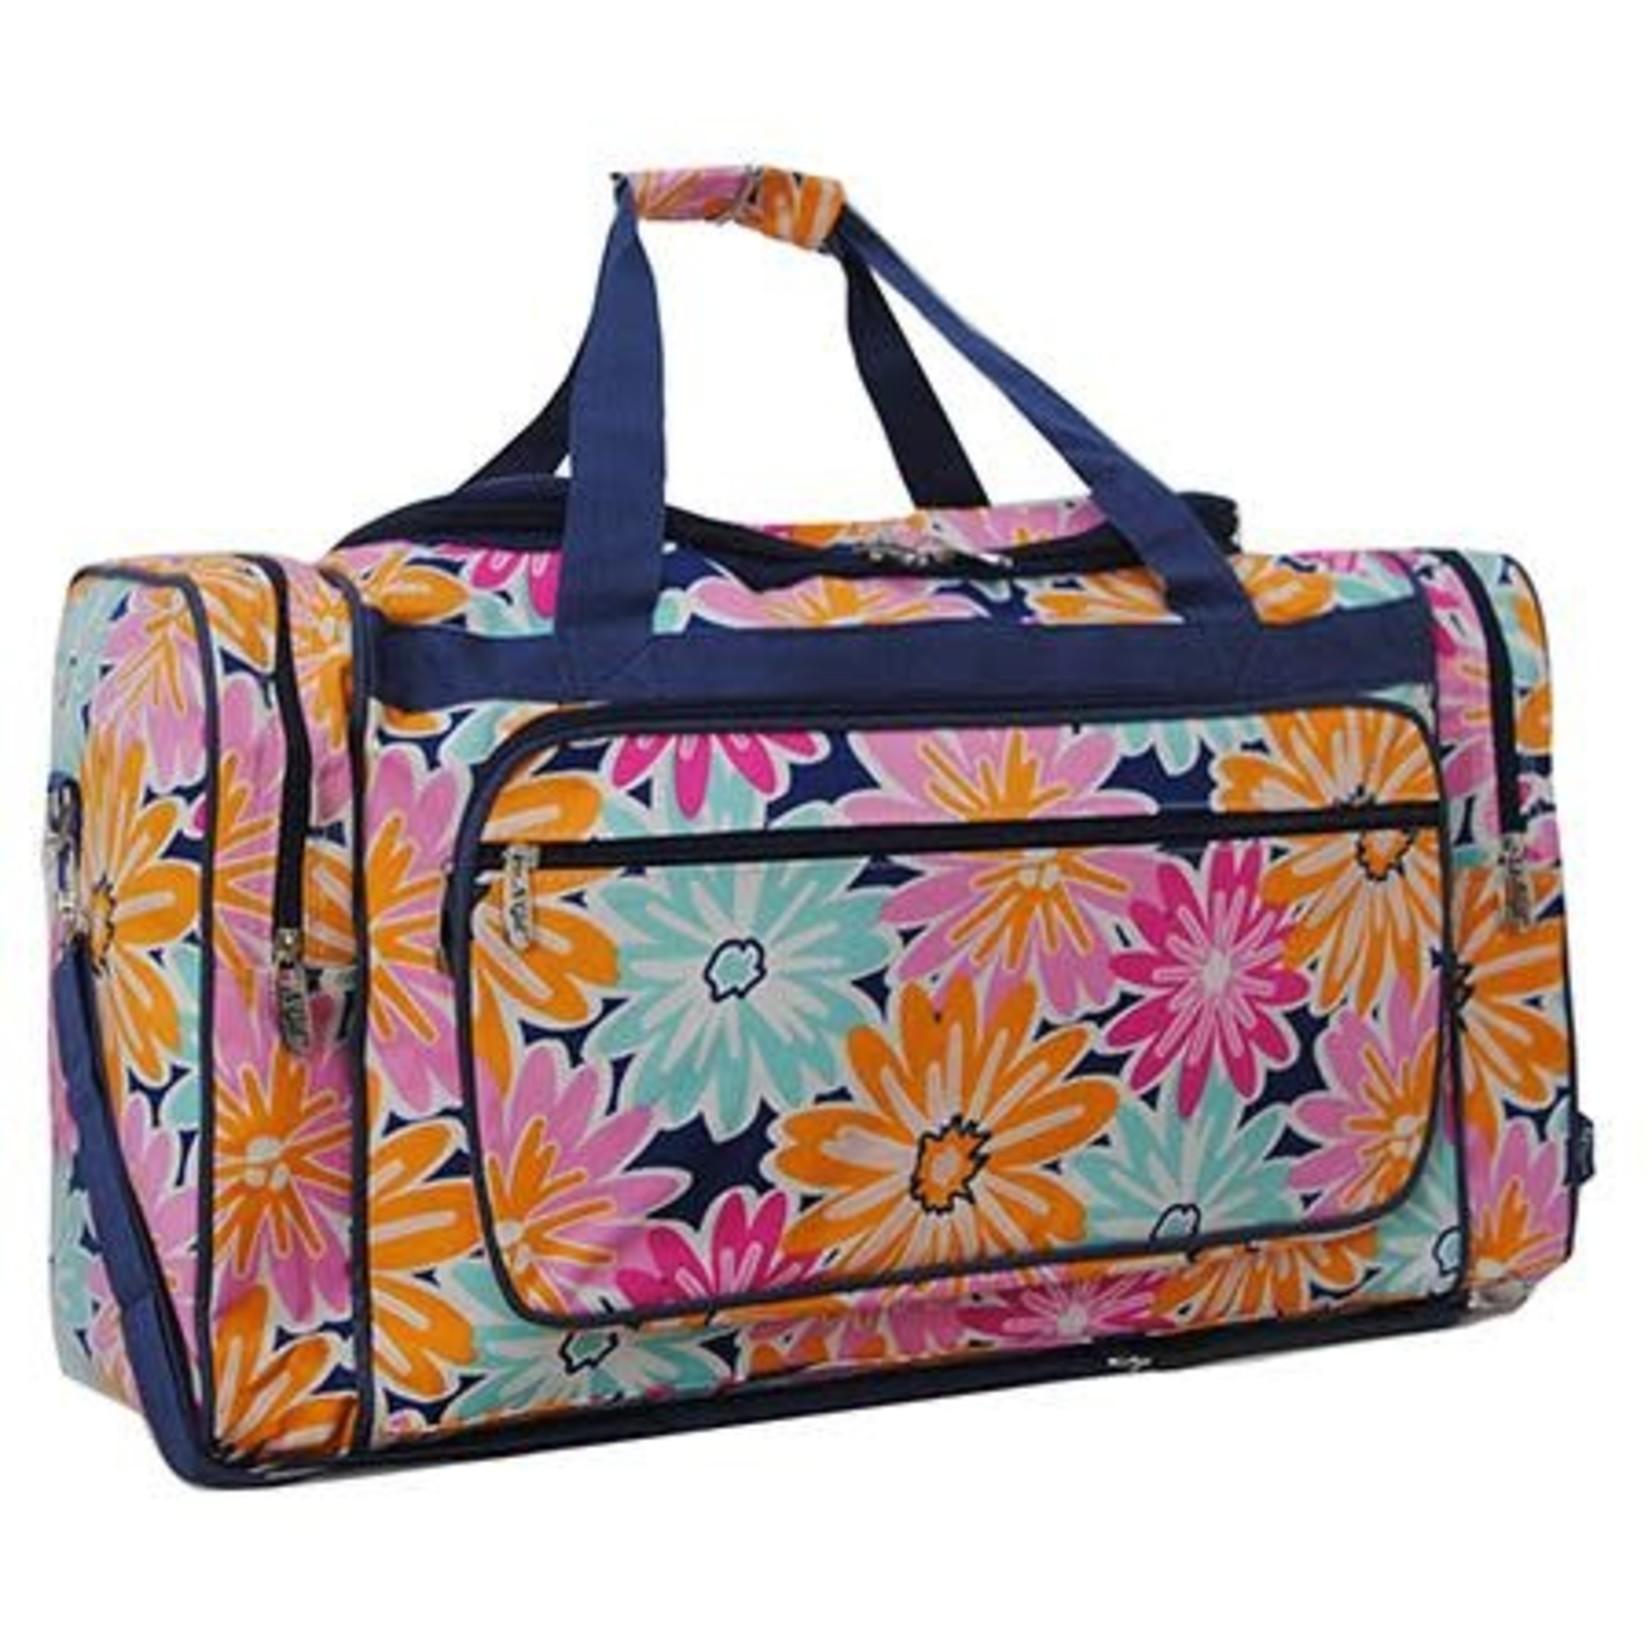 "Flower power 23"" duffle bag"